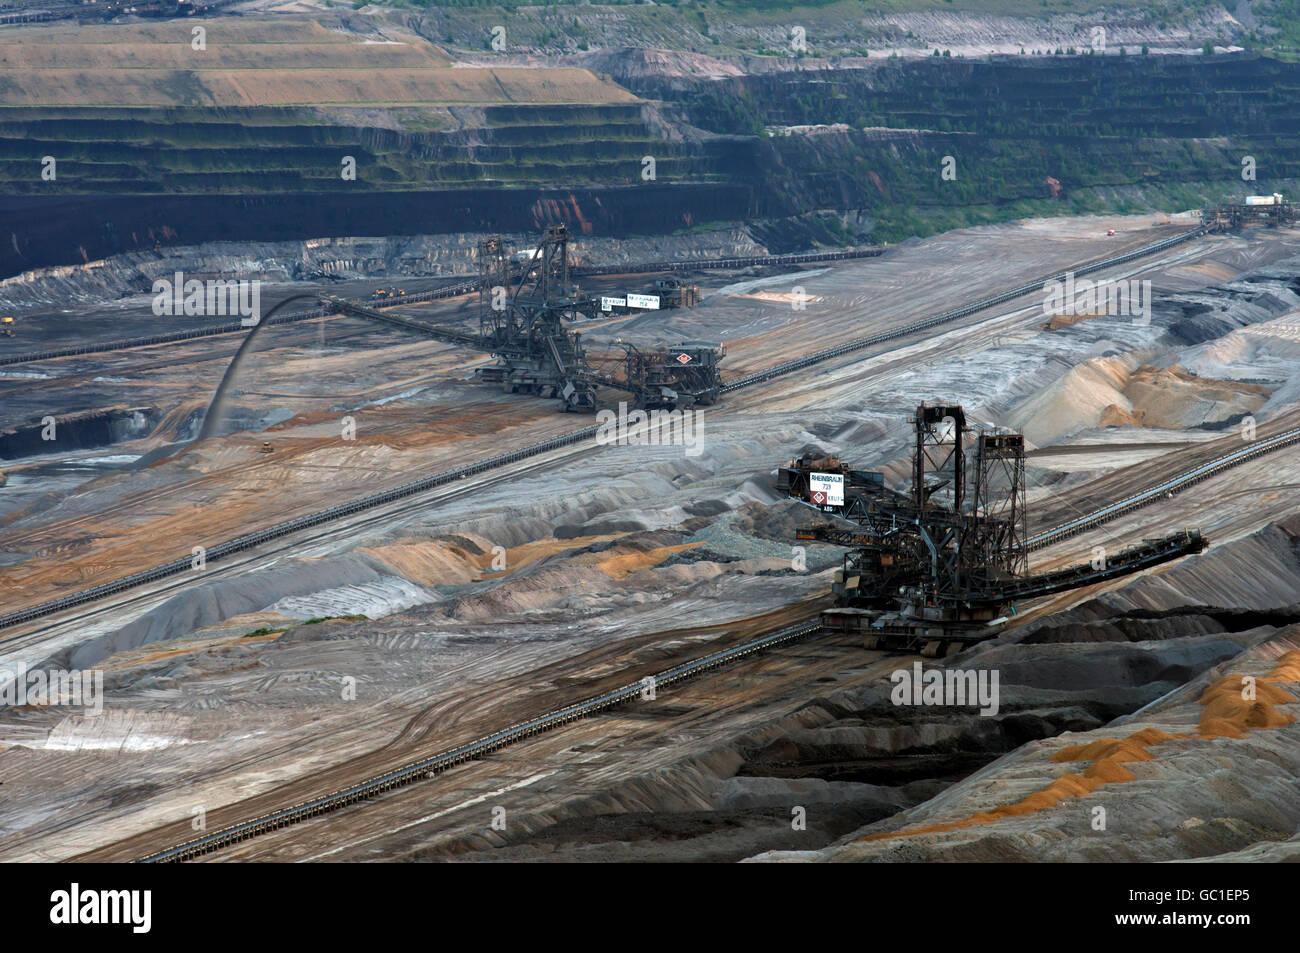 Hambach surface lignite mine Elsdorf, North Rhine-Westphalia, Germany. - Stock Image